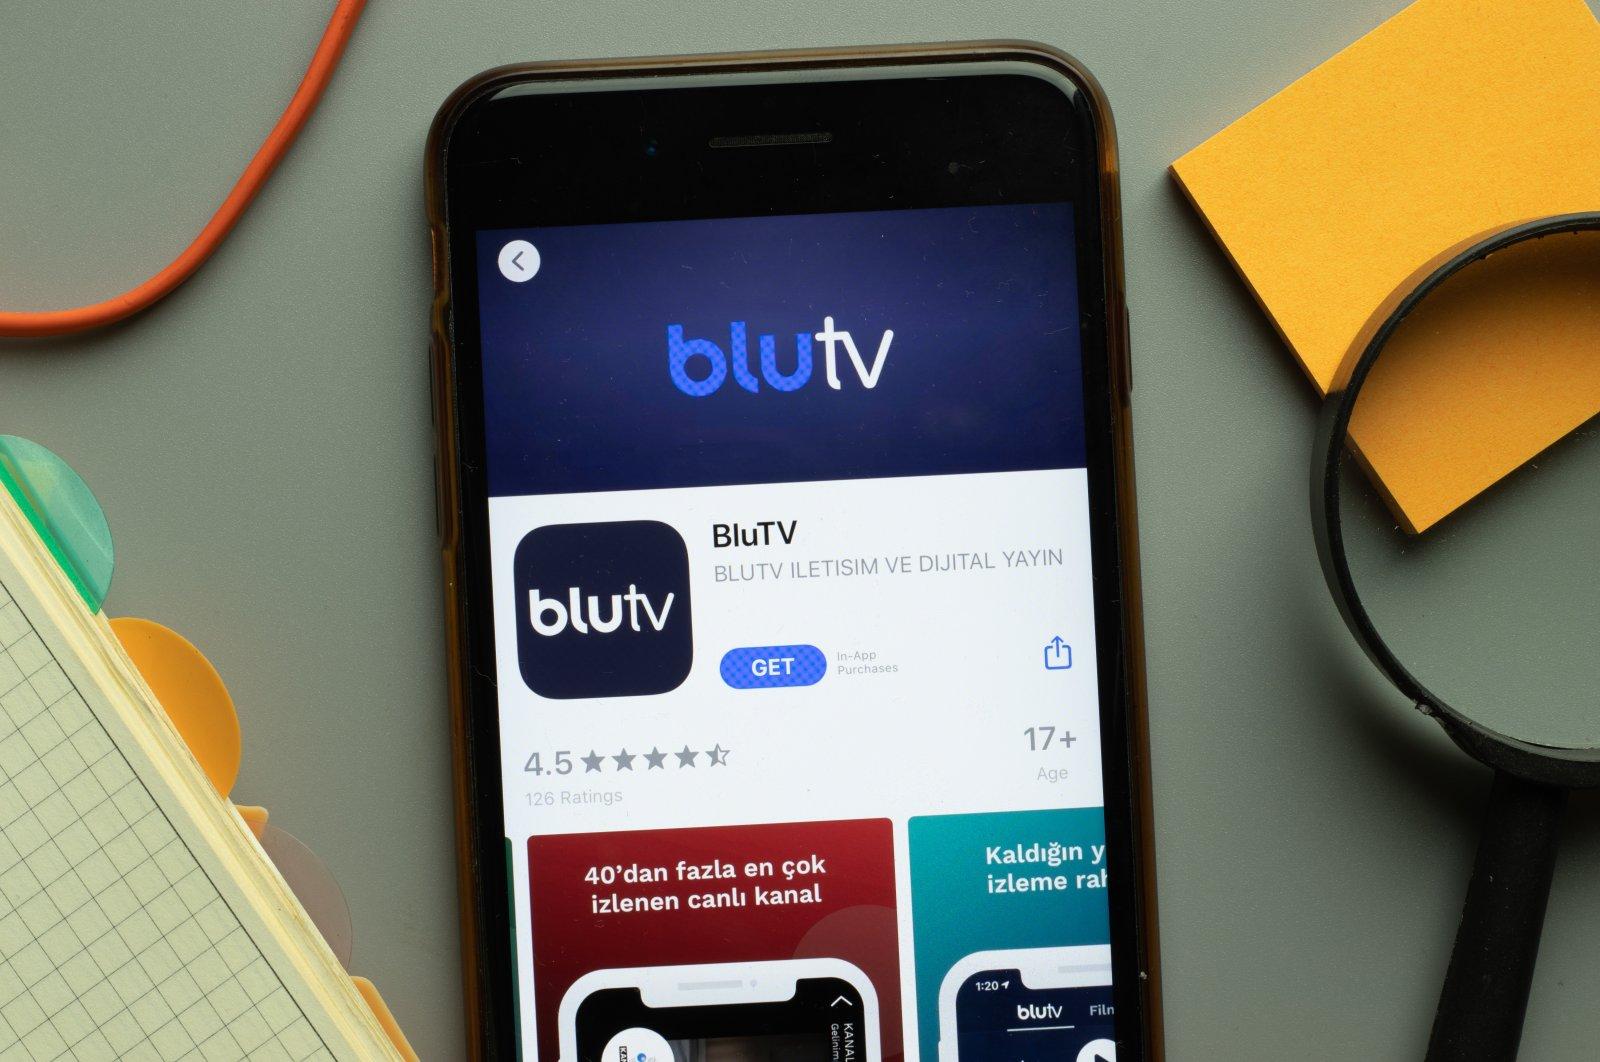 BluTV mobile app logo seen on a phone screen, New York, the U.S., Oct. 26, 2020. (Shutterstock Photo)